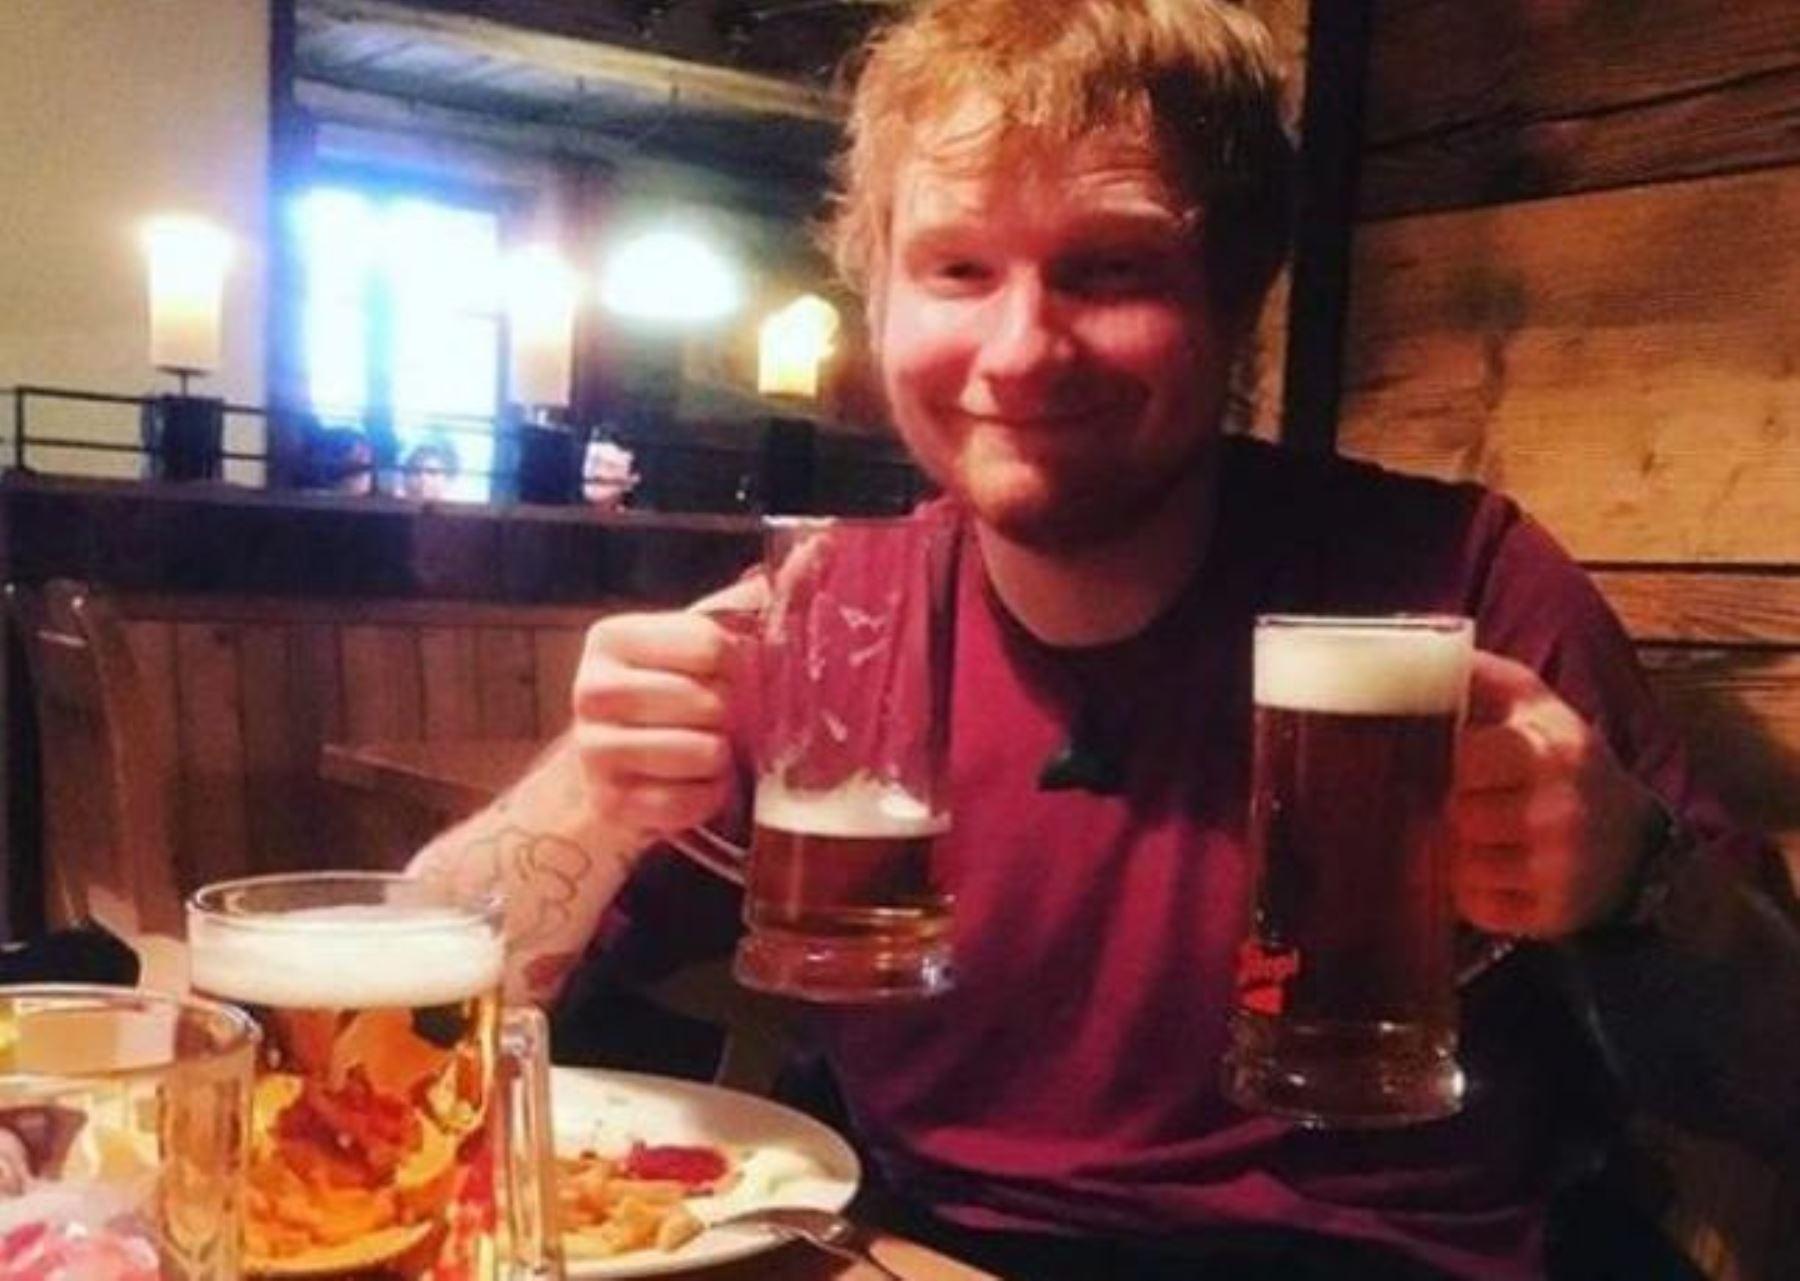 Ed Sheeran visitó Machu Picchu junto a su novia | Noticias ...